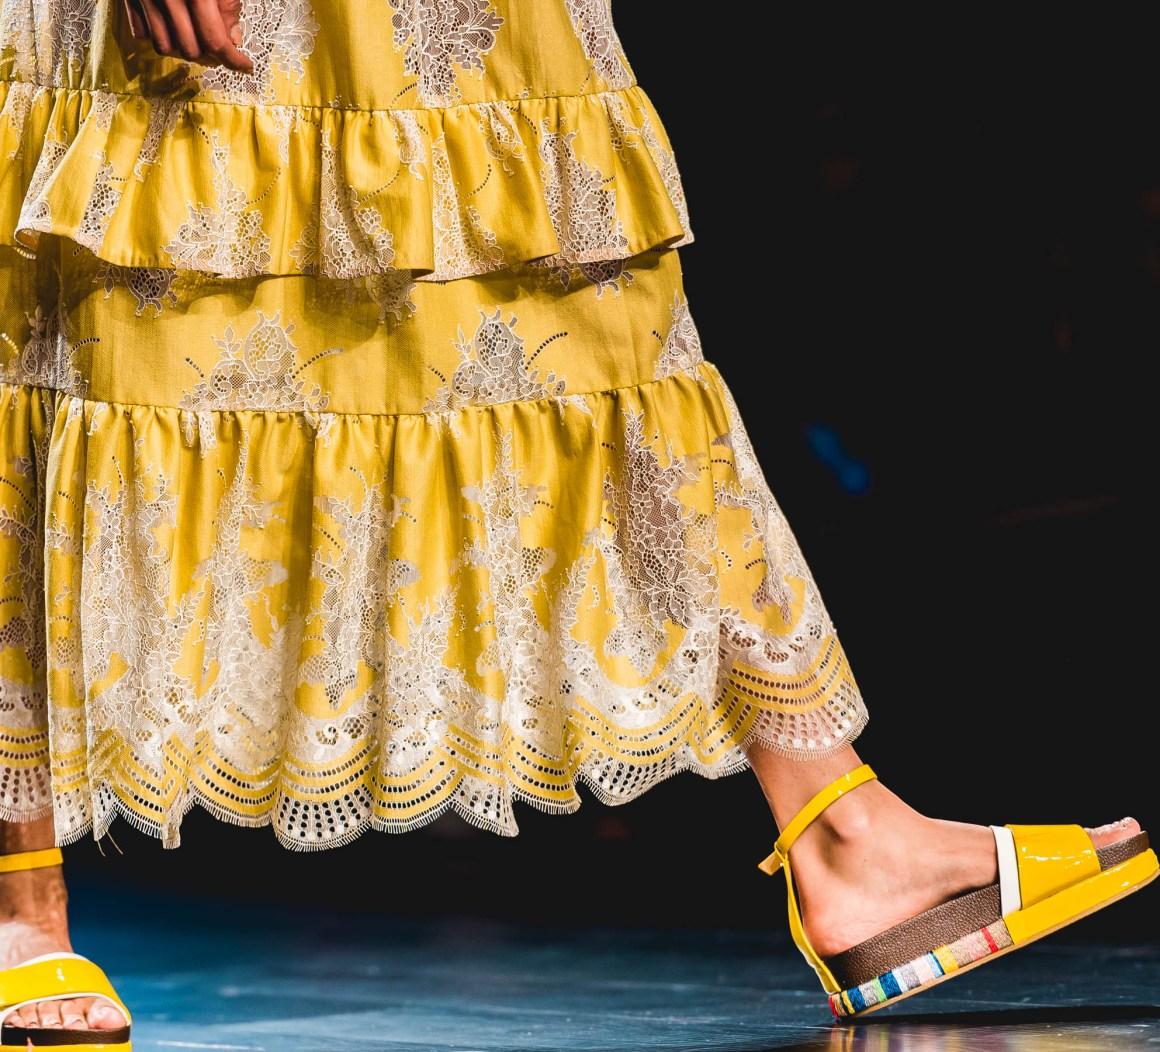 Naina Redhu, Naina.co, Rahul Mishra, Divya Mishra, Fashion Designer, FDCI, Lotus MakeUp India Fashion Week Spring Summer 2019, LMIFWSS19, LMIFW, India Fashion Week, Fashion Week Delhi, MadeInIndia, Made In India, EyesForFashion, Professional Photographer, Blogger, Fashion Photographer, Lifestyle Photographer, Luxury Photographer, Delhi Photographer, Gurgaon Photographer, Delhi Blogger, Gurgaon Blogger, Indian Blogger